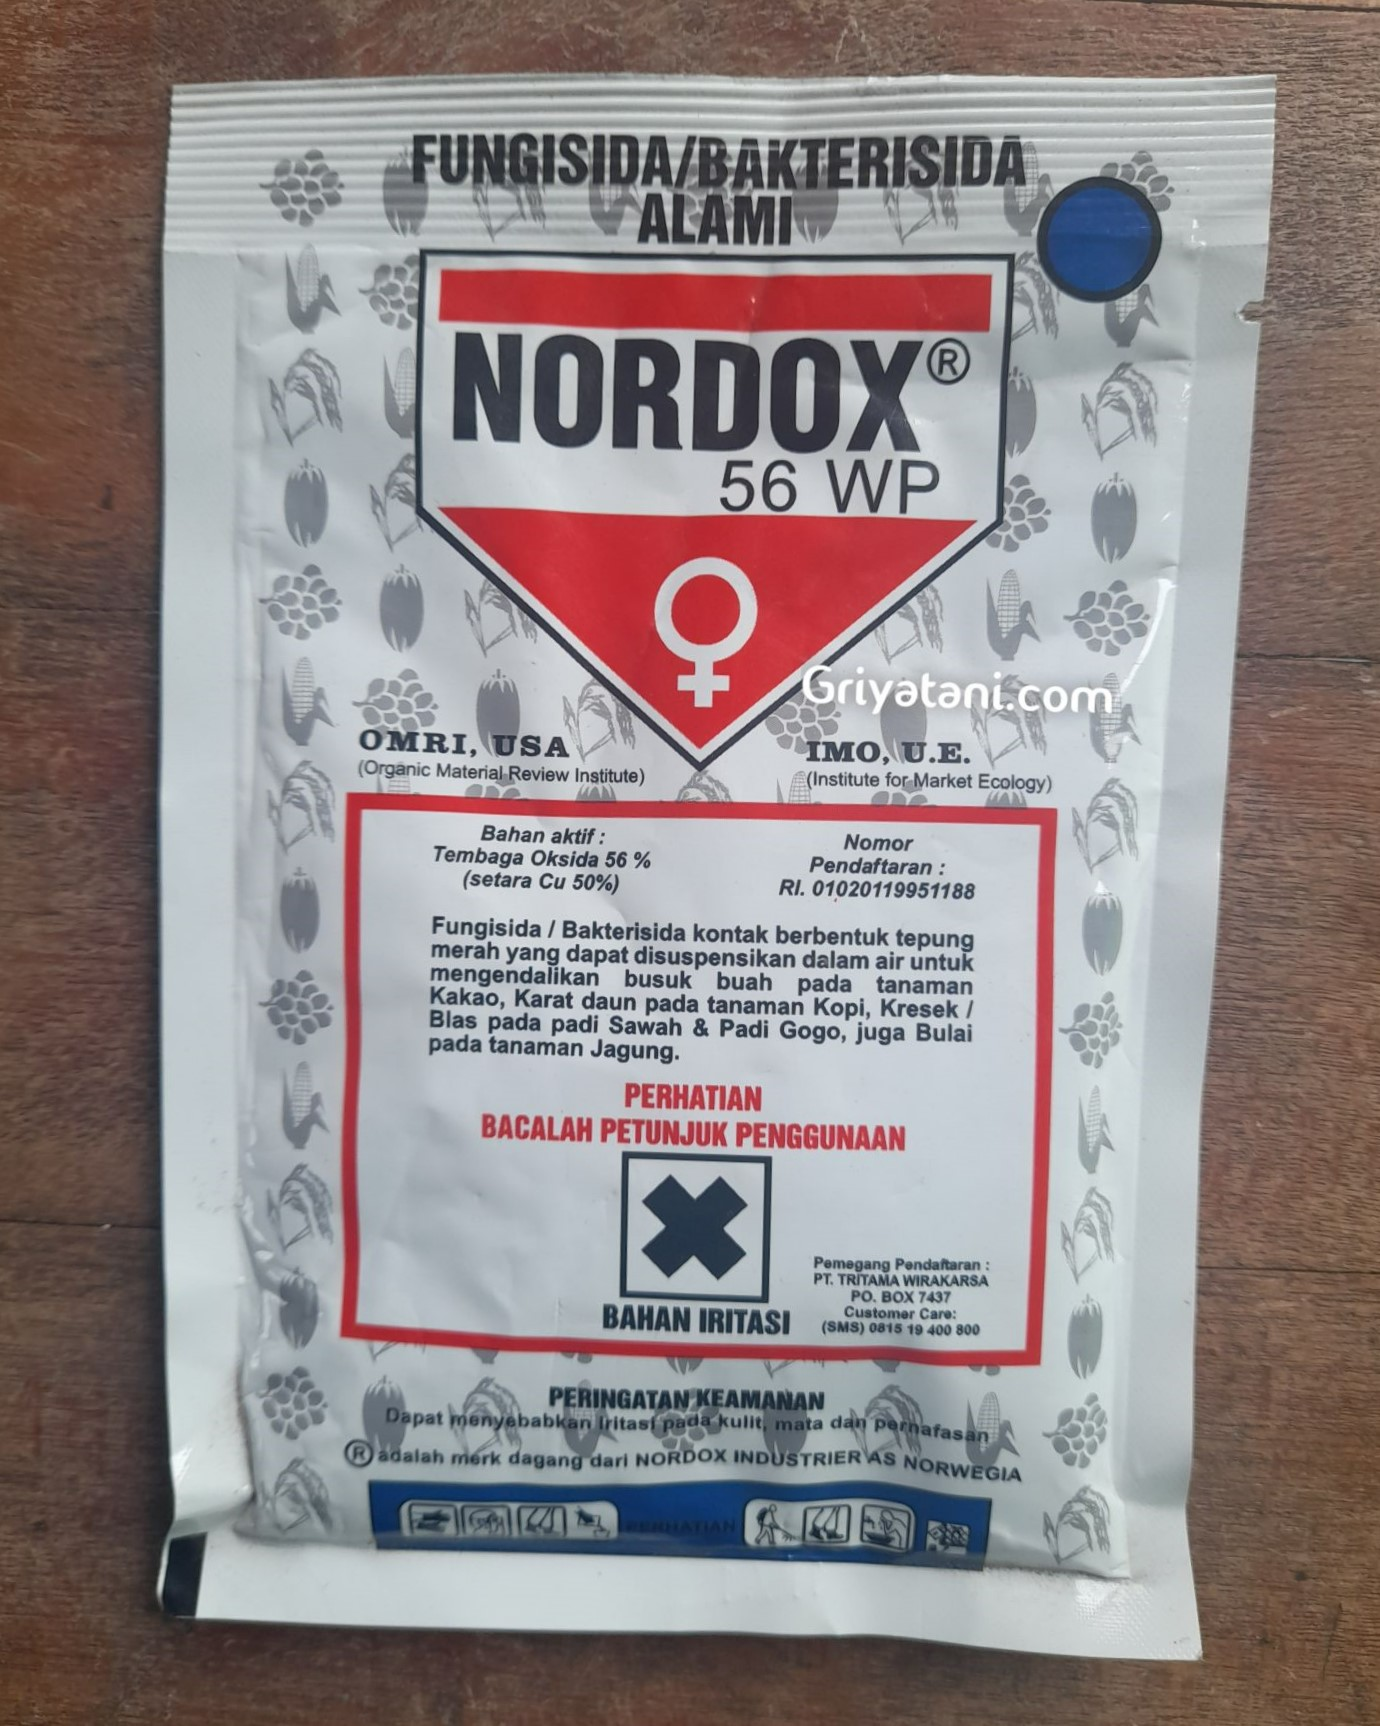 Nordox 56WP